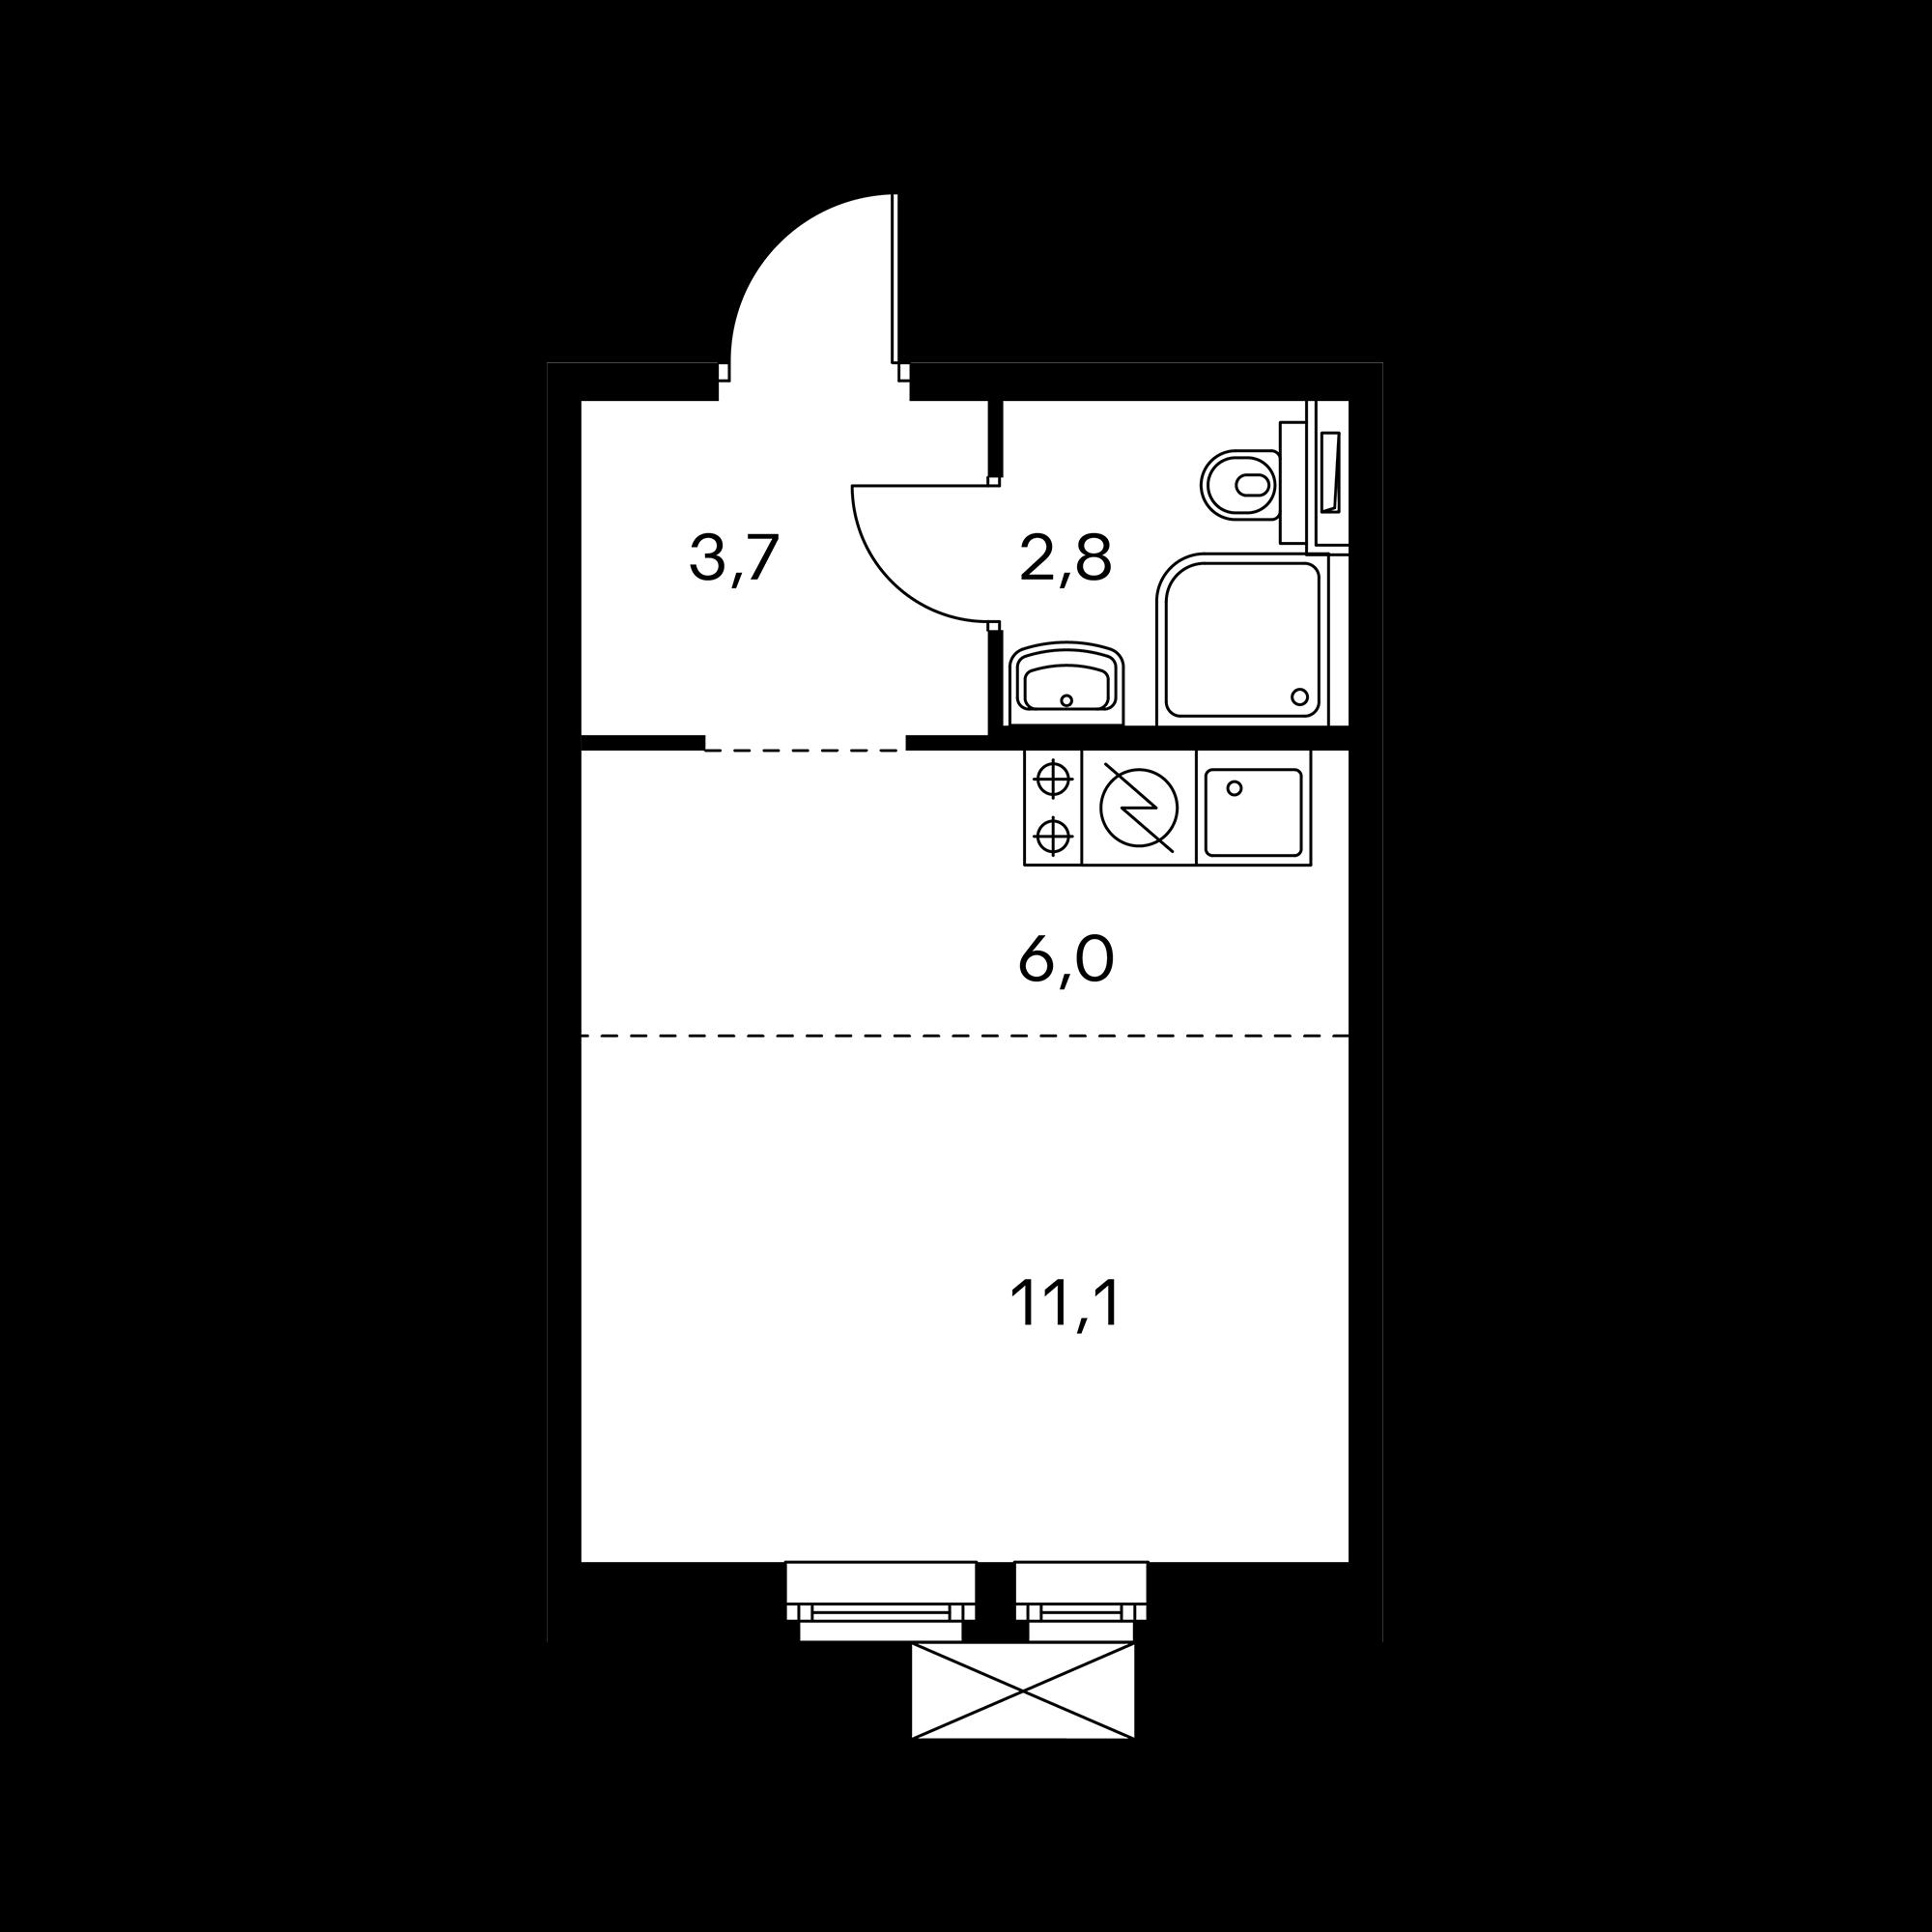 1NS1_4.2-1_1